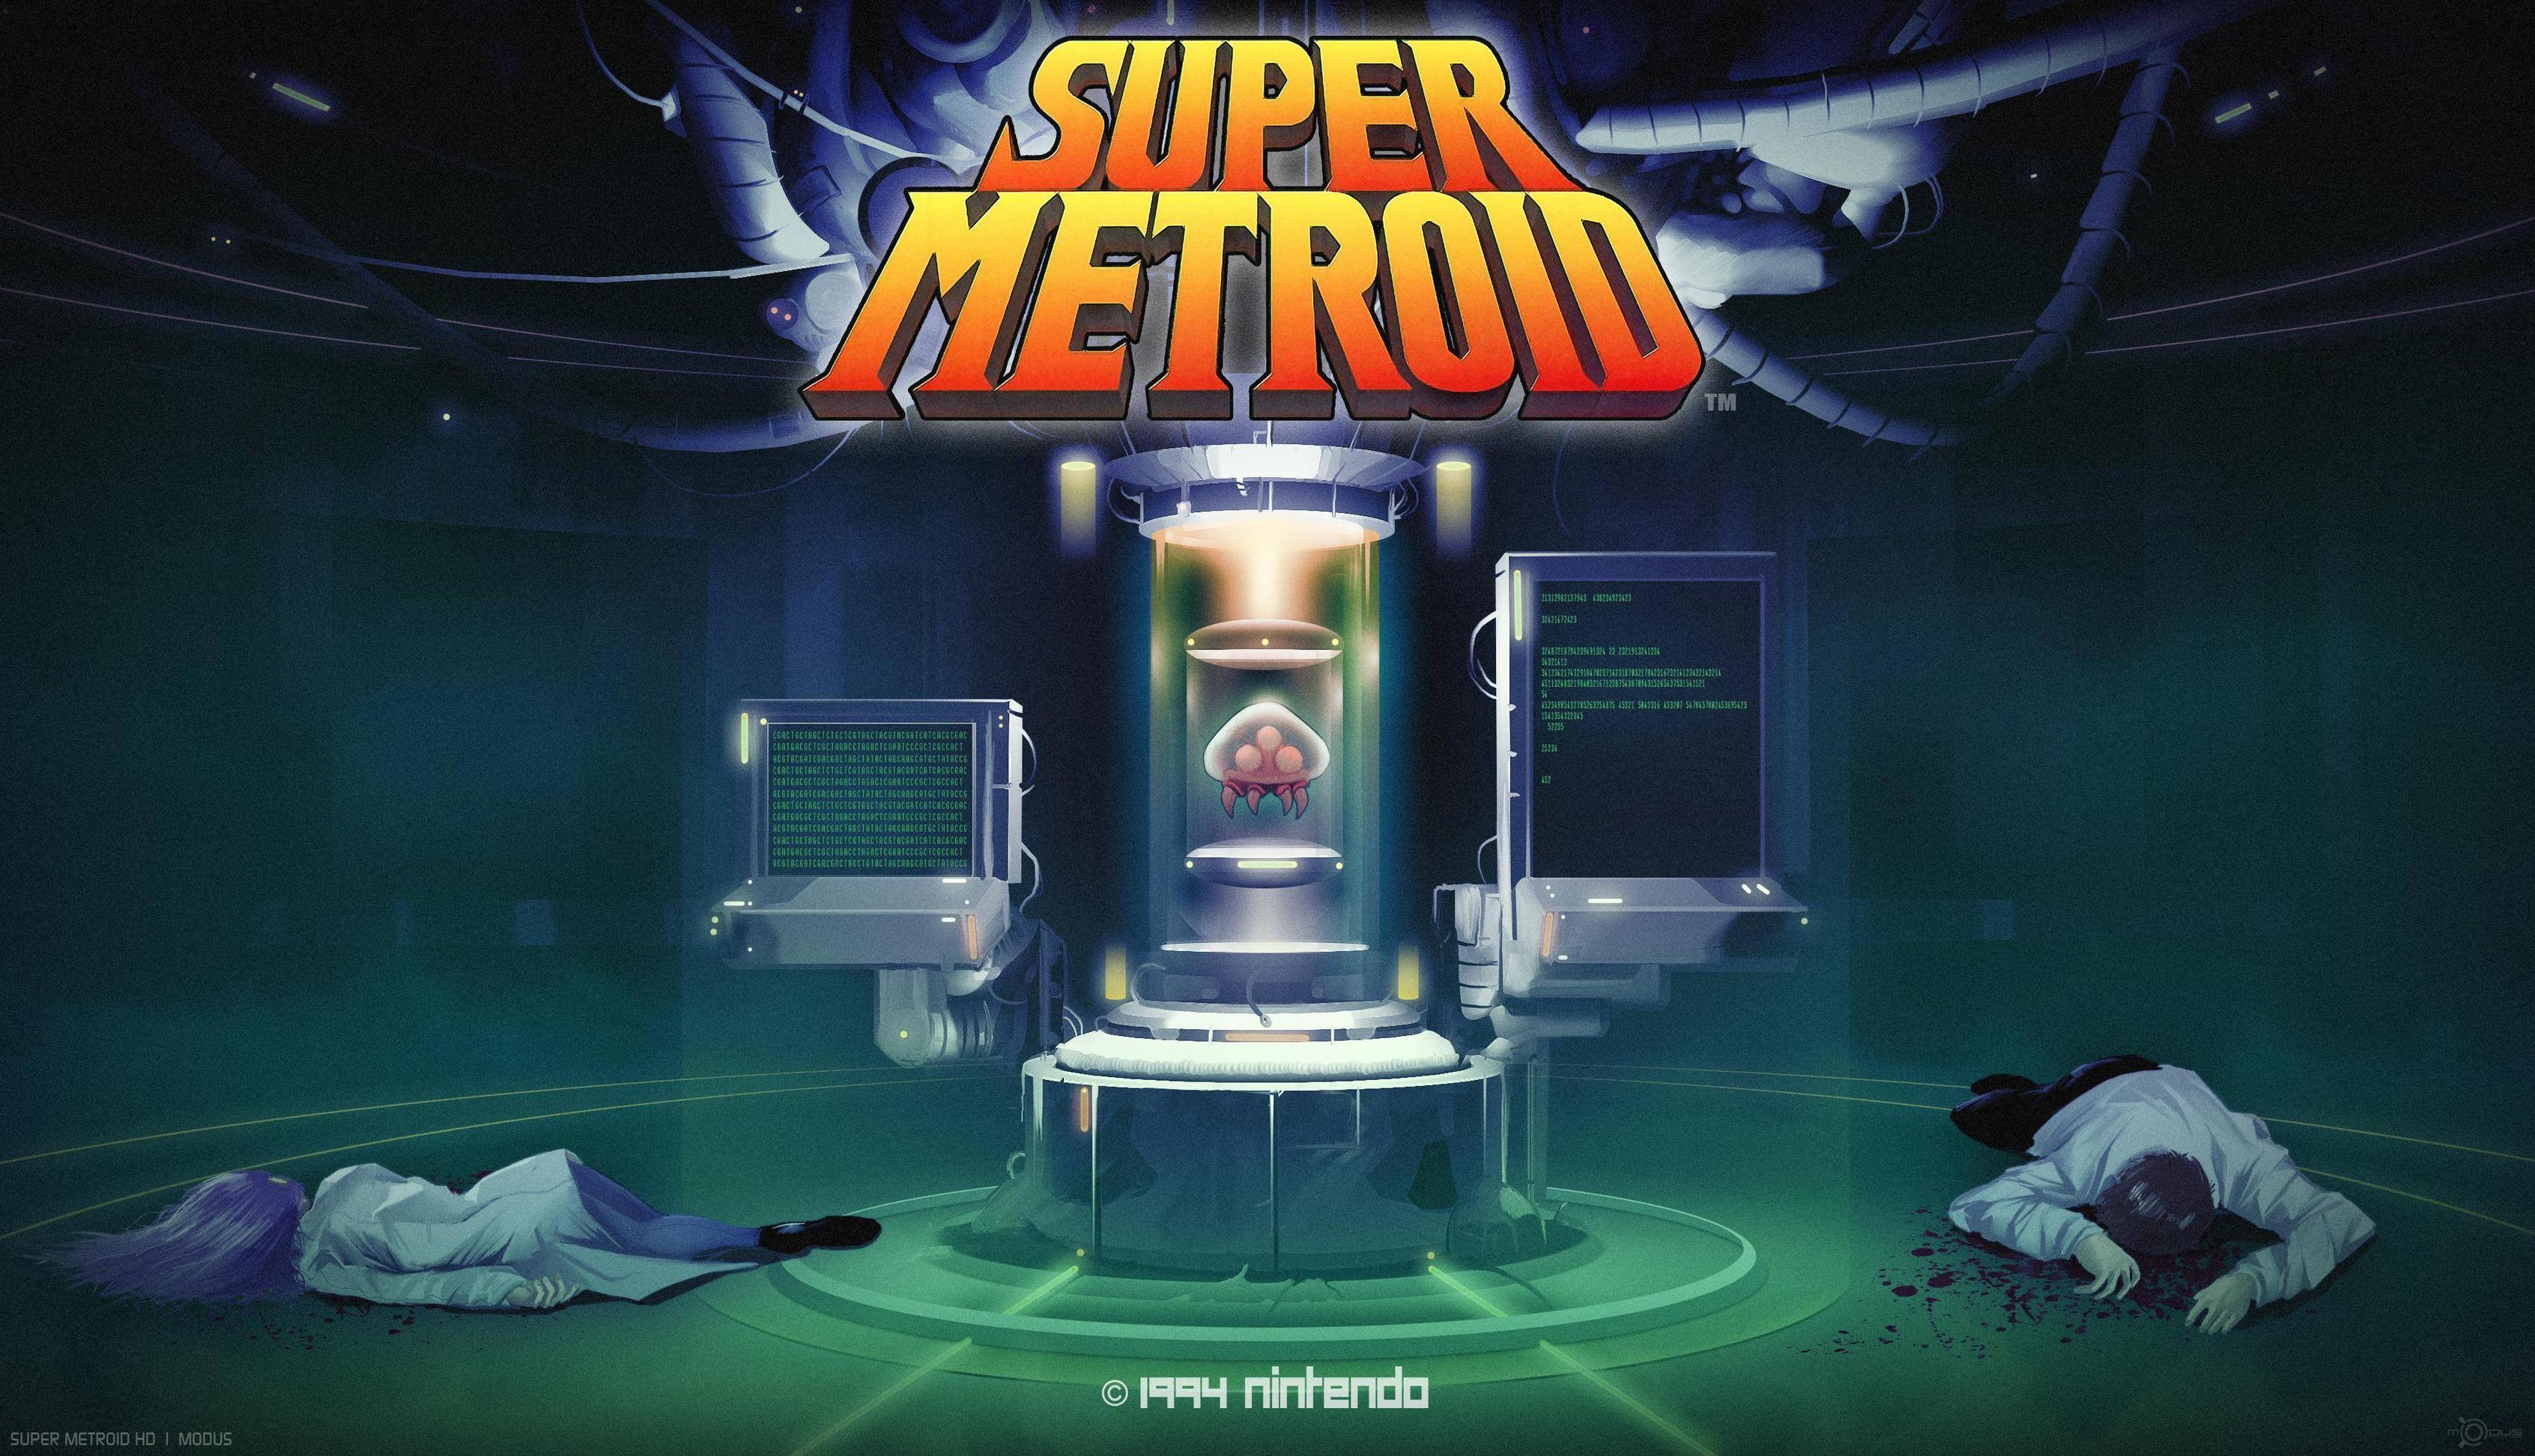 Super Metroid Wallpapers - Wallpaper Cave